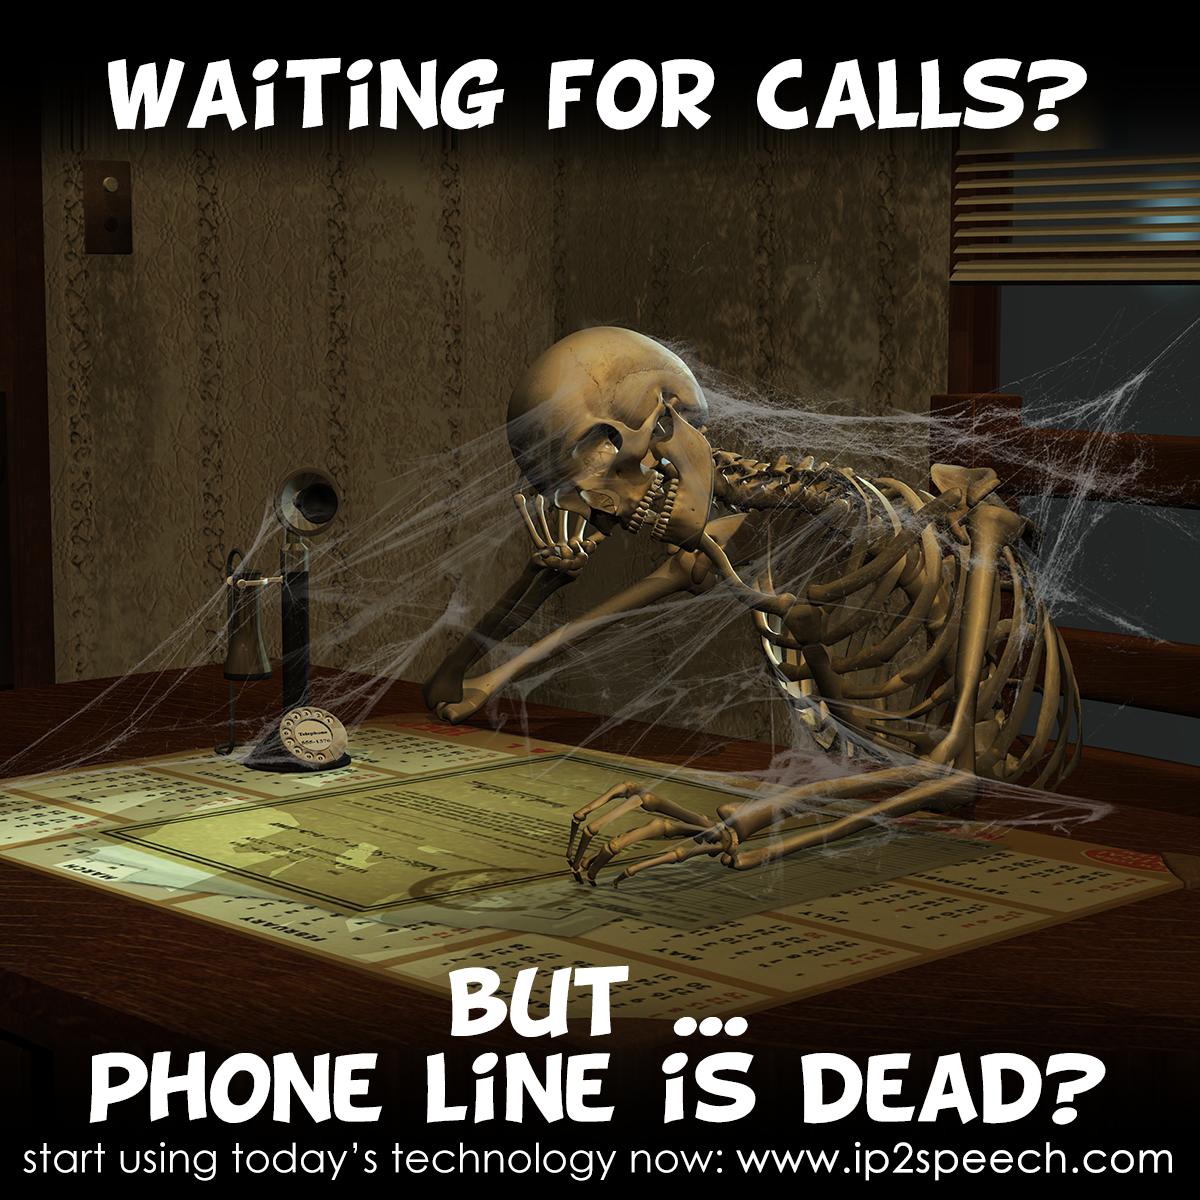 insta-death-line